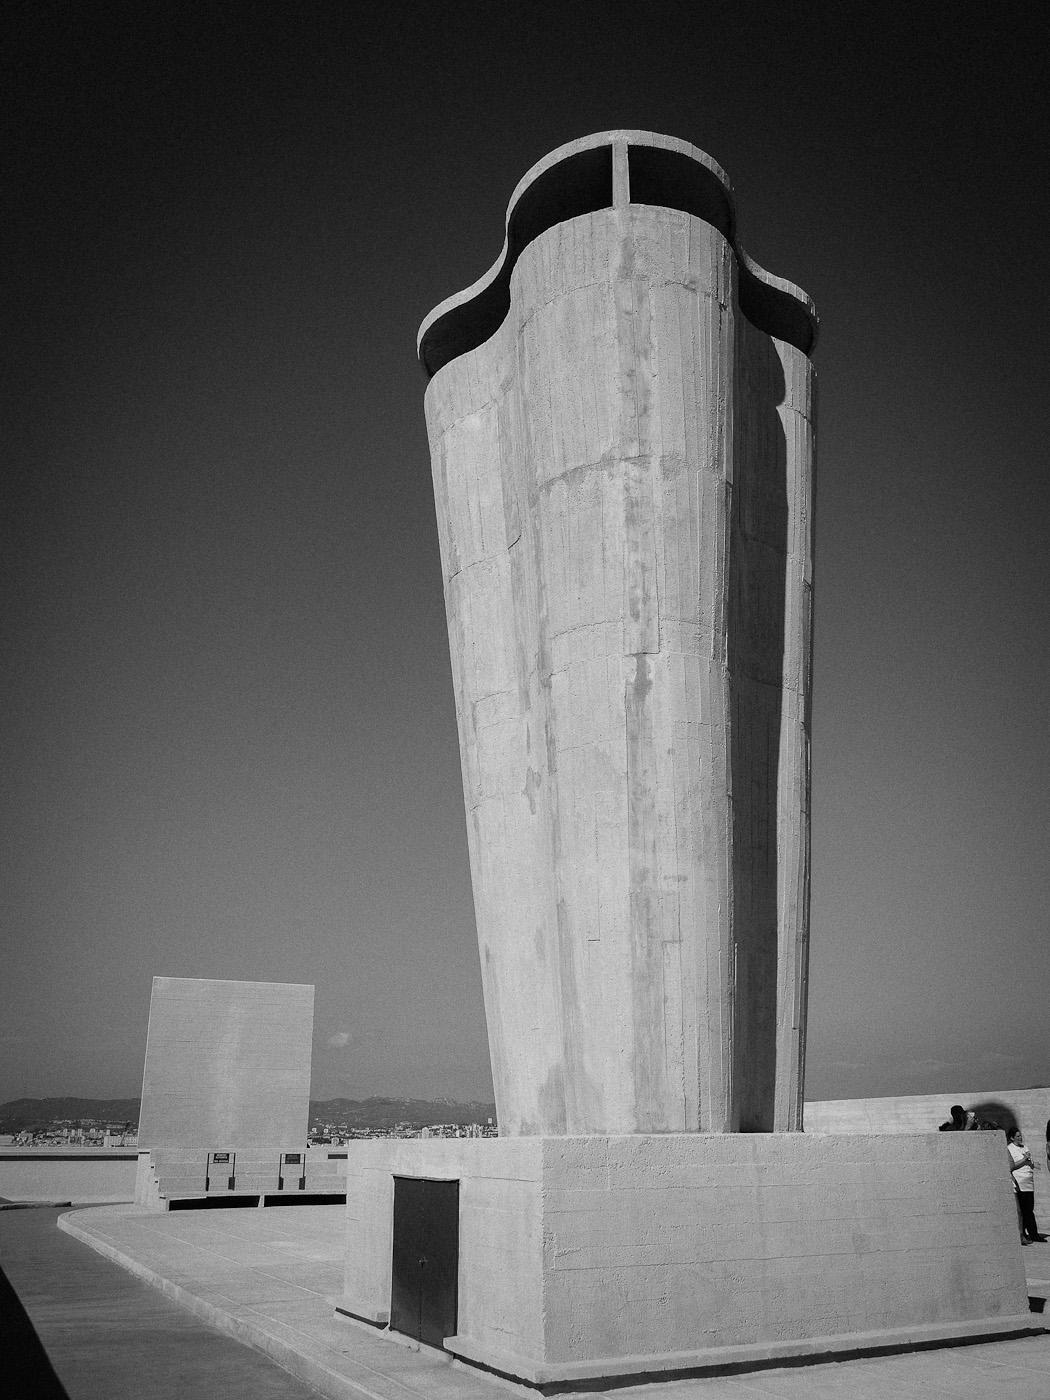 A chimney and rooftop theater at Le Corbusier's La Cité Radieuse, Marseilles. Olympus OM-D E-M5.